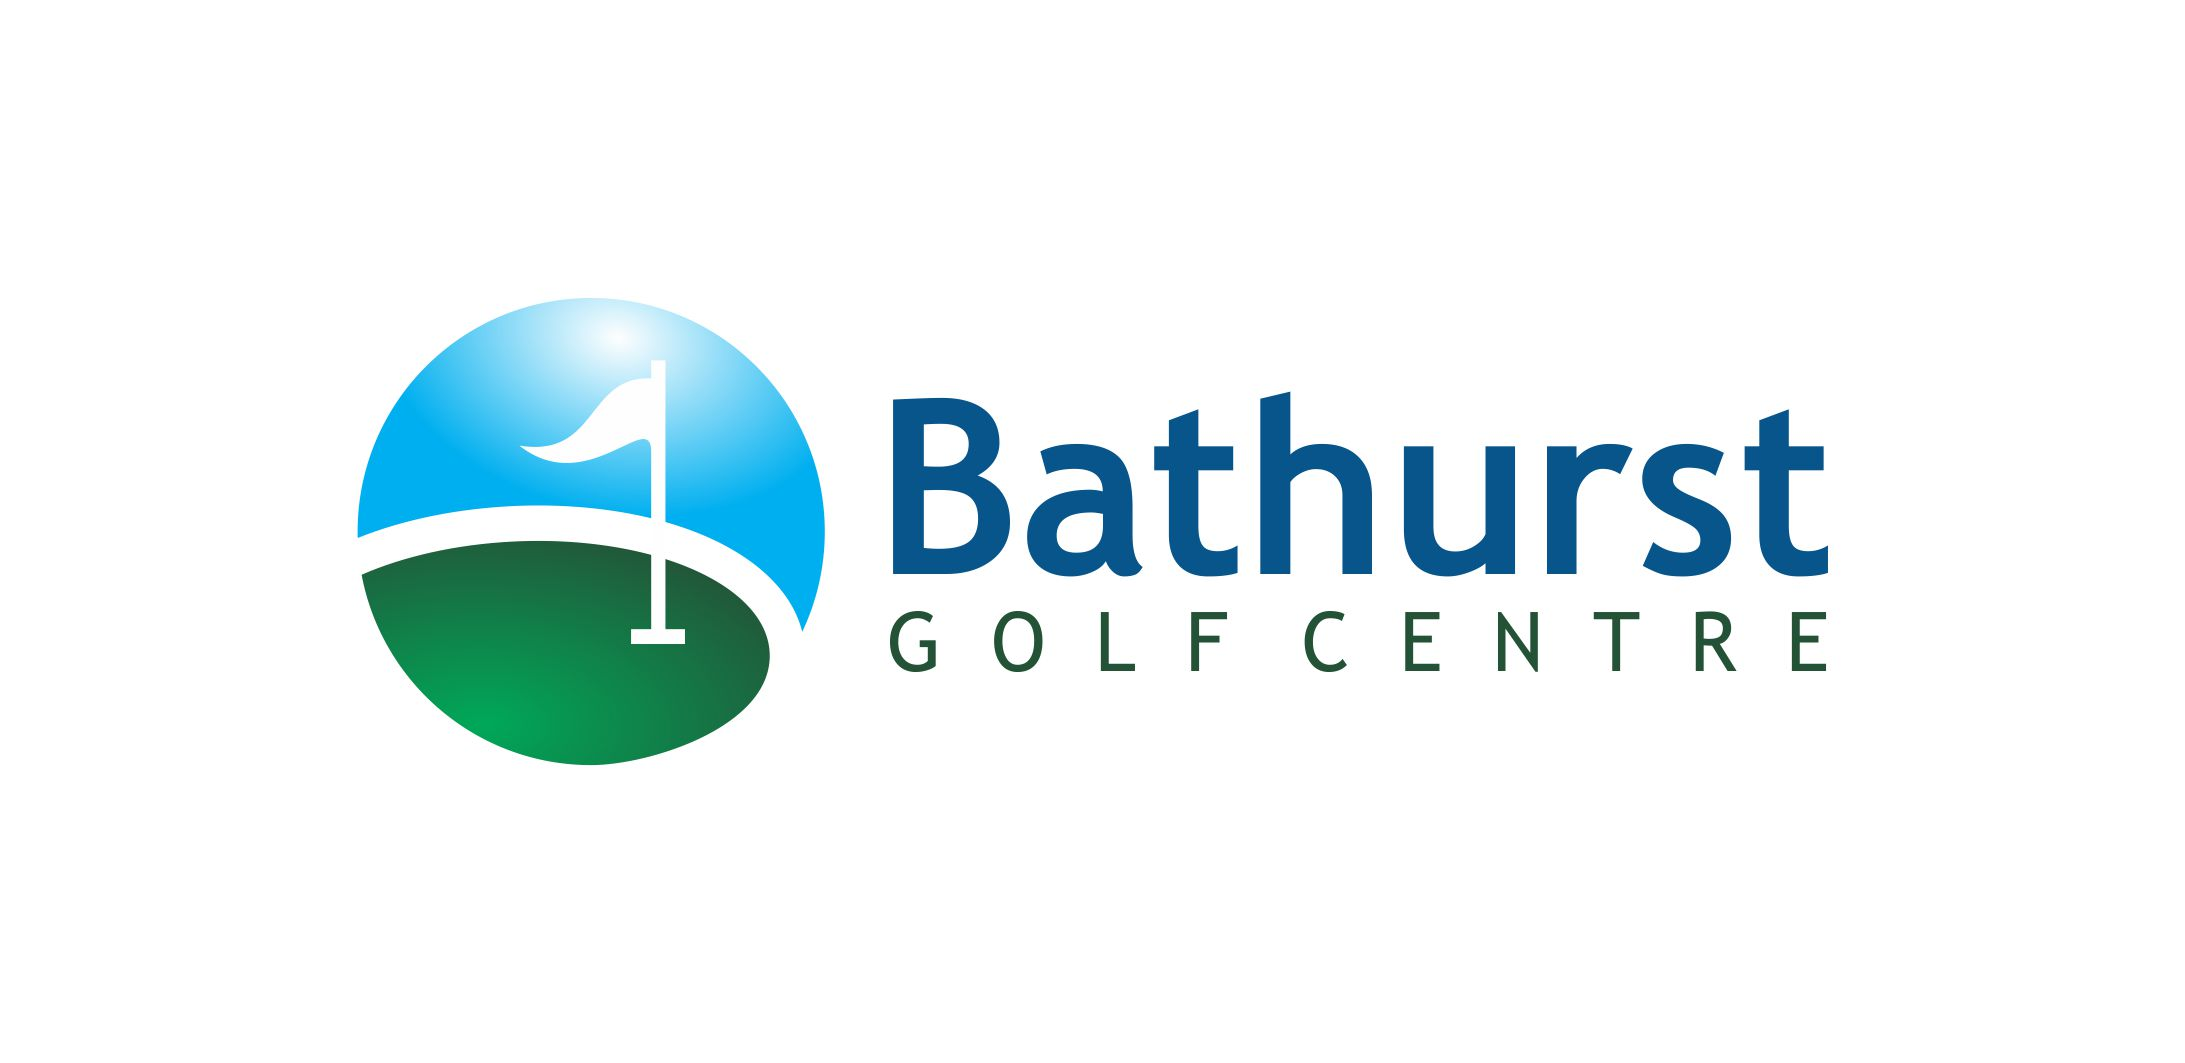 Logo Design by Amit Kaushik - Entry No. 92 in the Logo Design Contest Inspiring Logo Design for Bathurst Golf Centre.